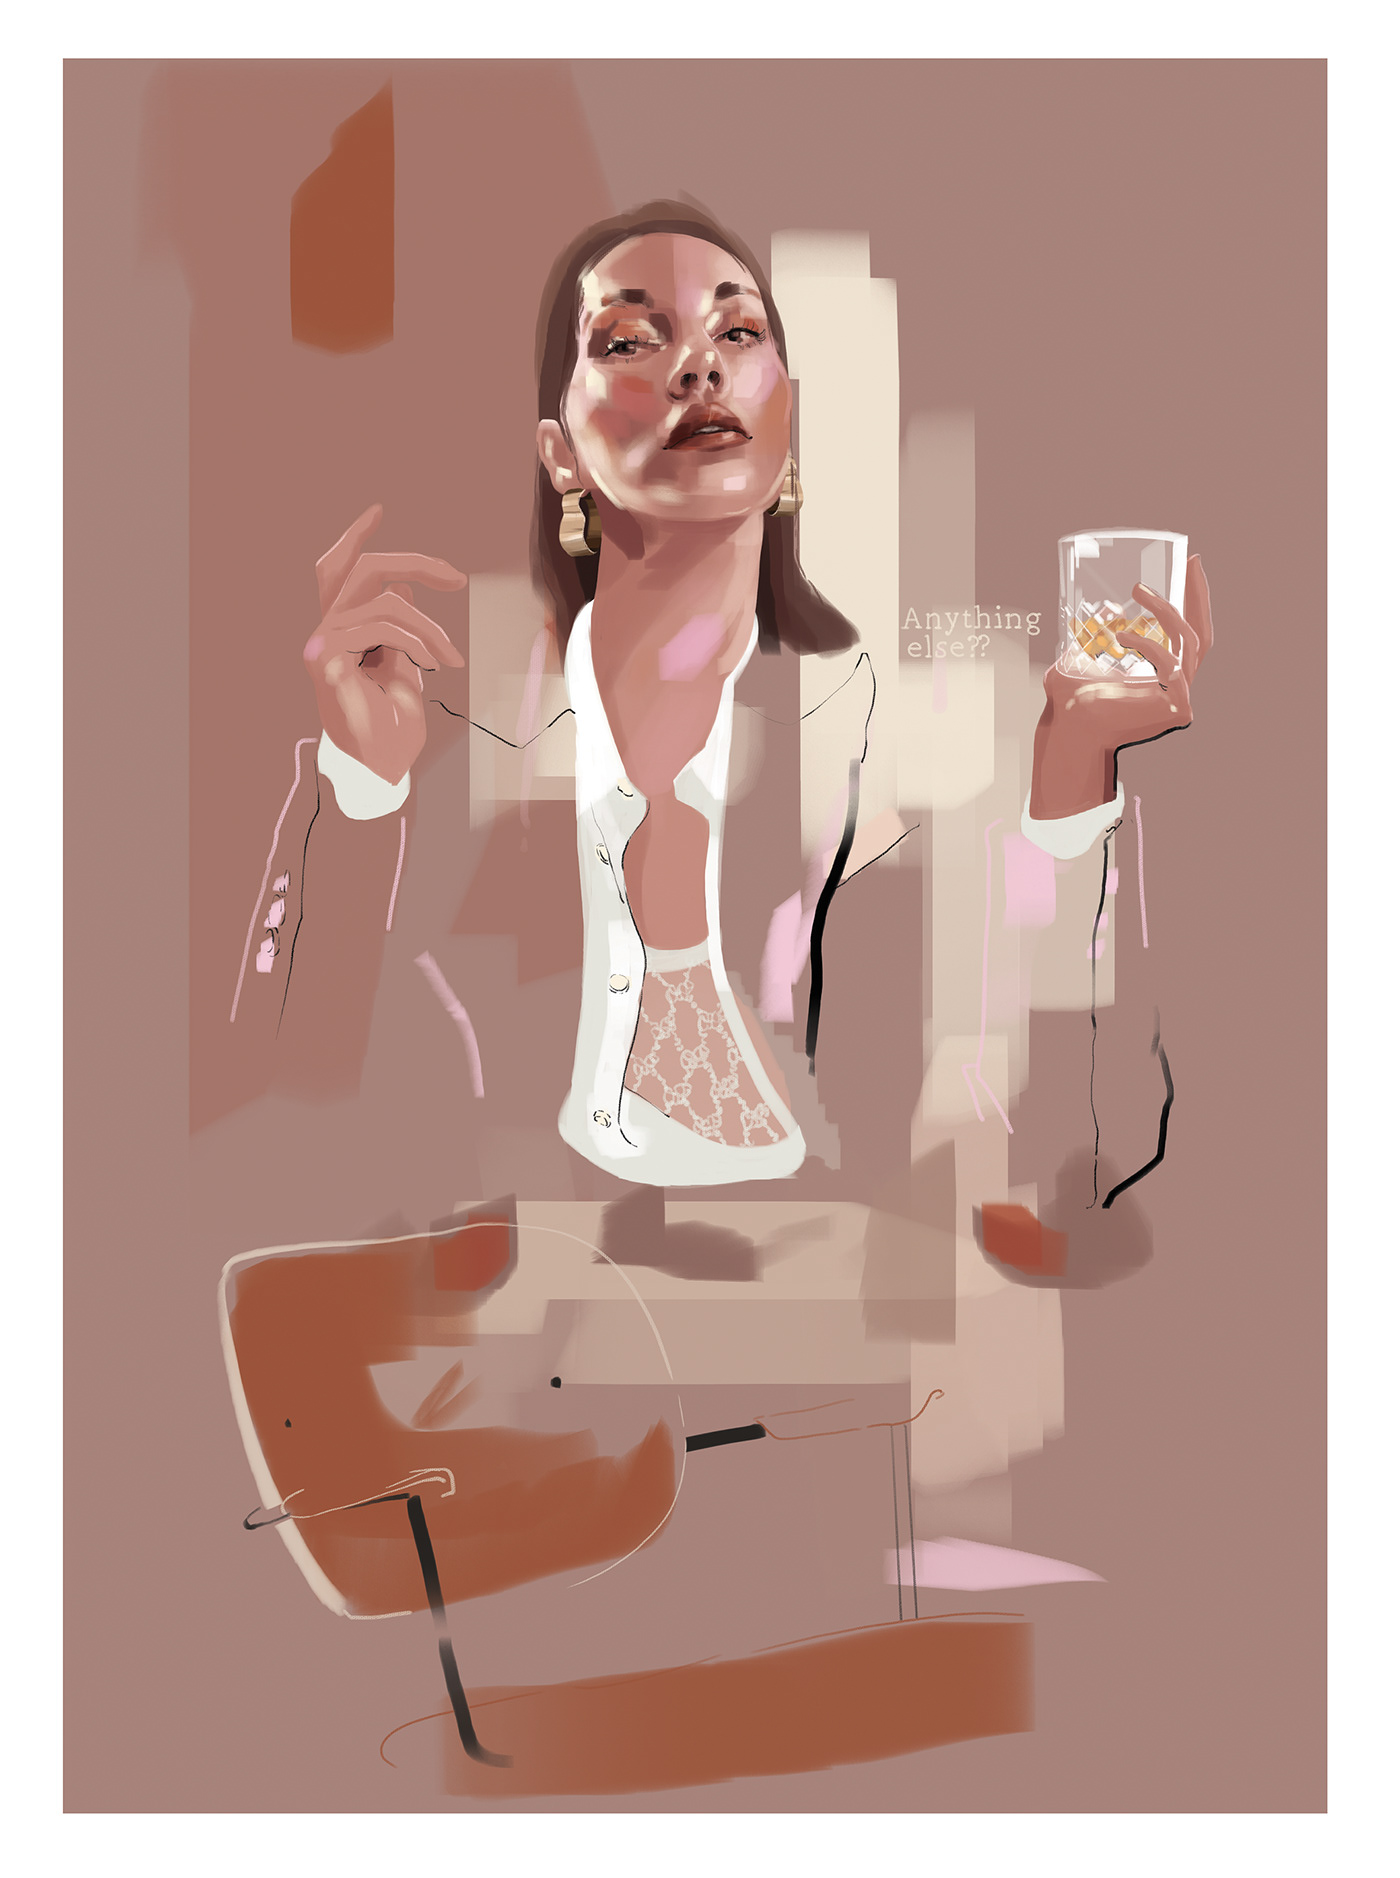 boss business corporate Fashion  fashionillustration manager Office scotch woman Woman Power